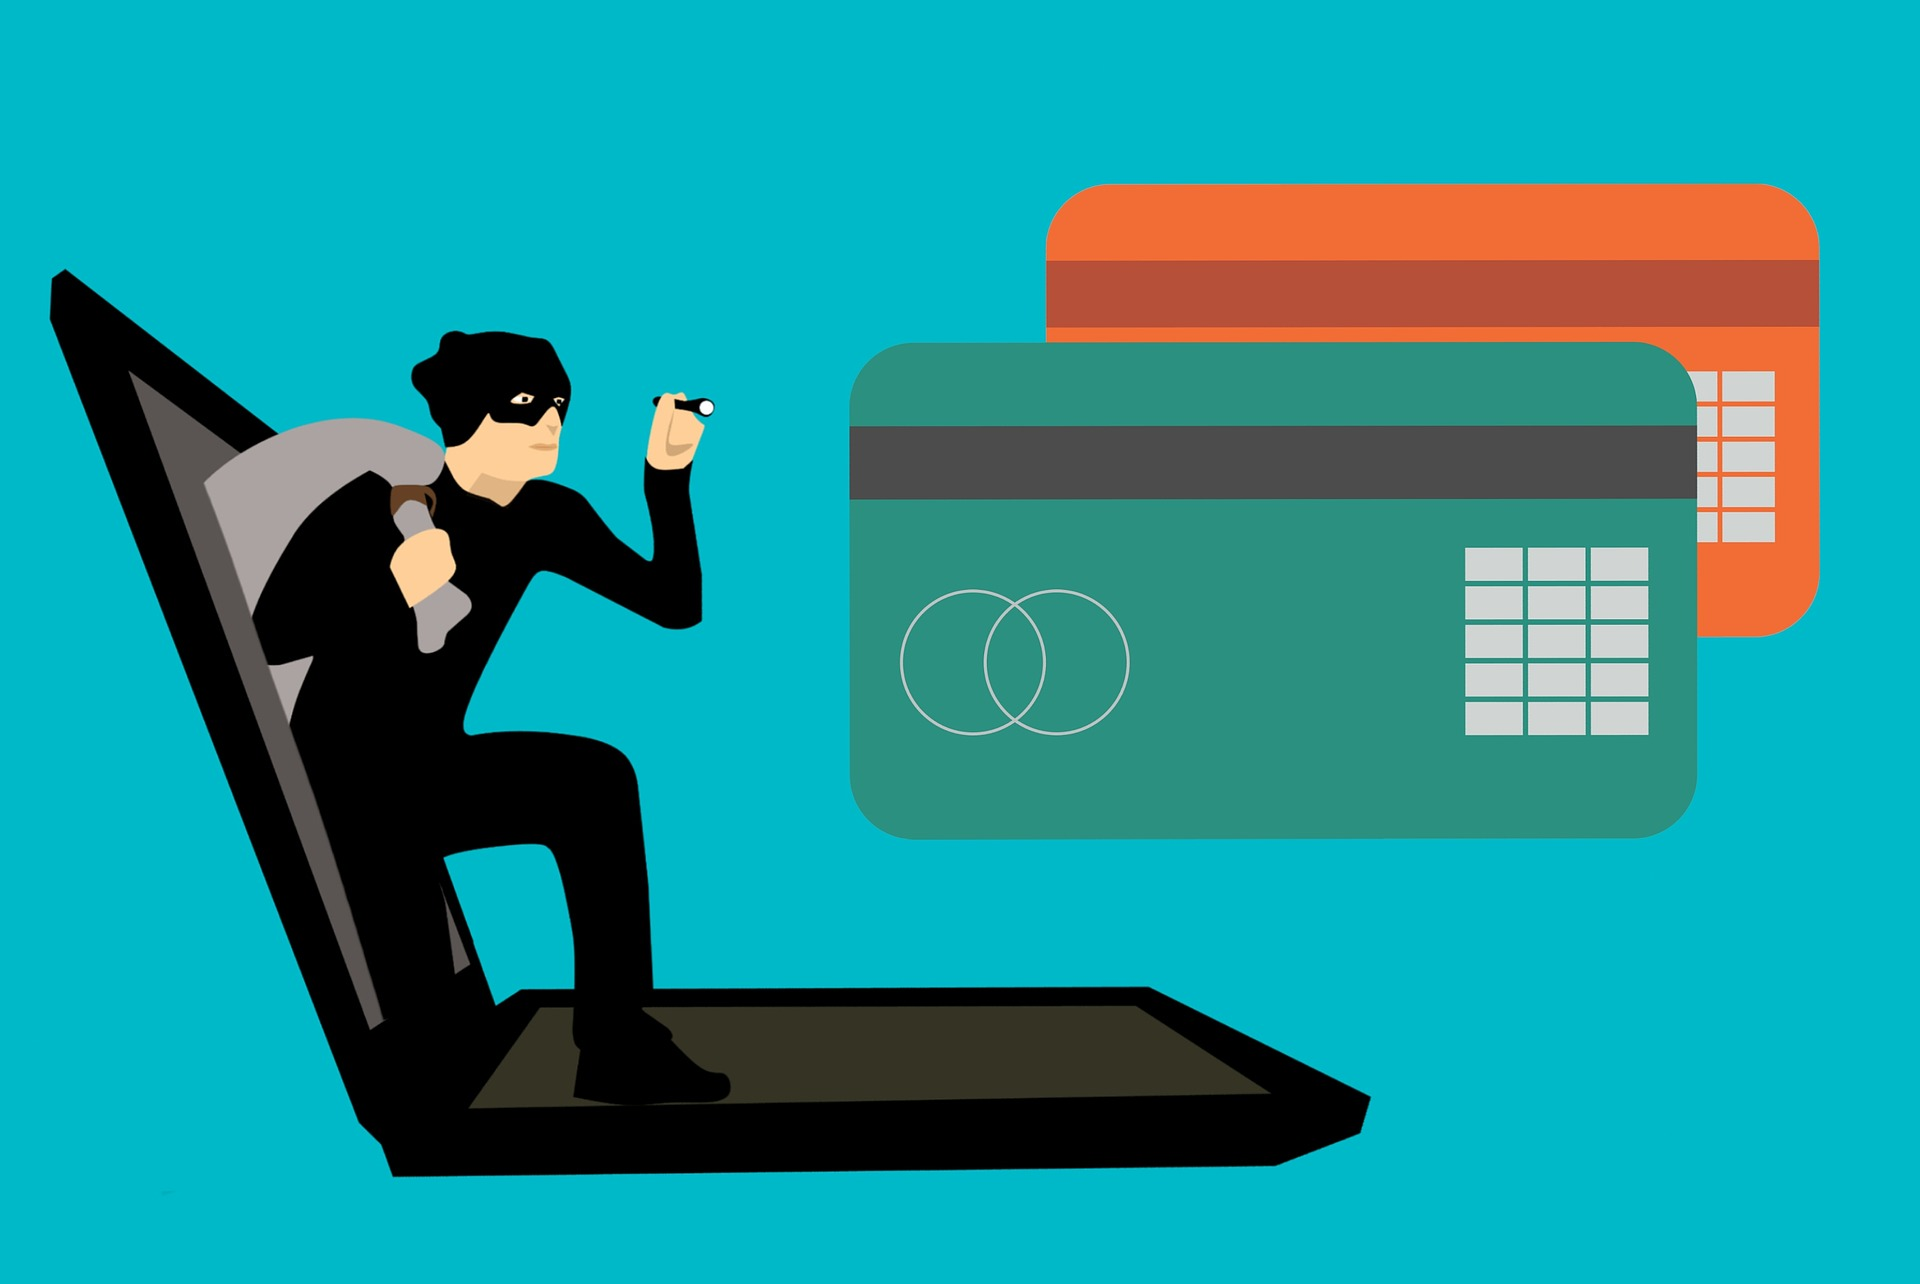 Common Indicator of phishing attempt